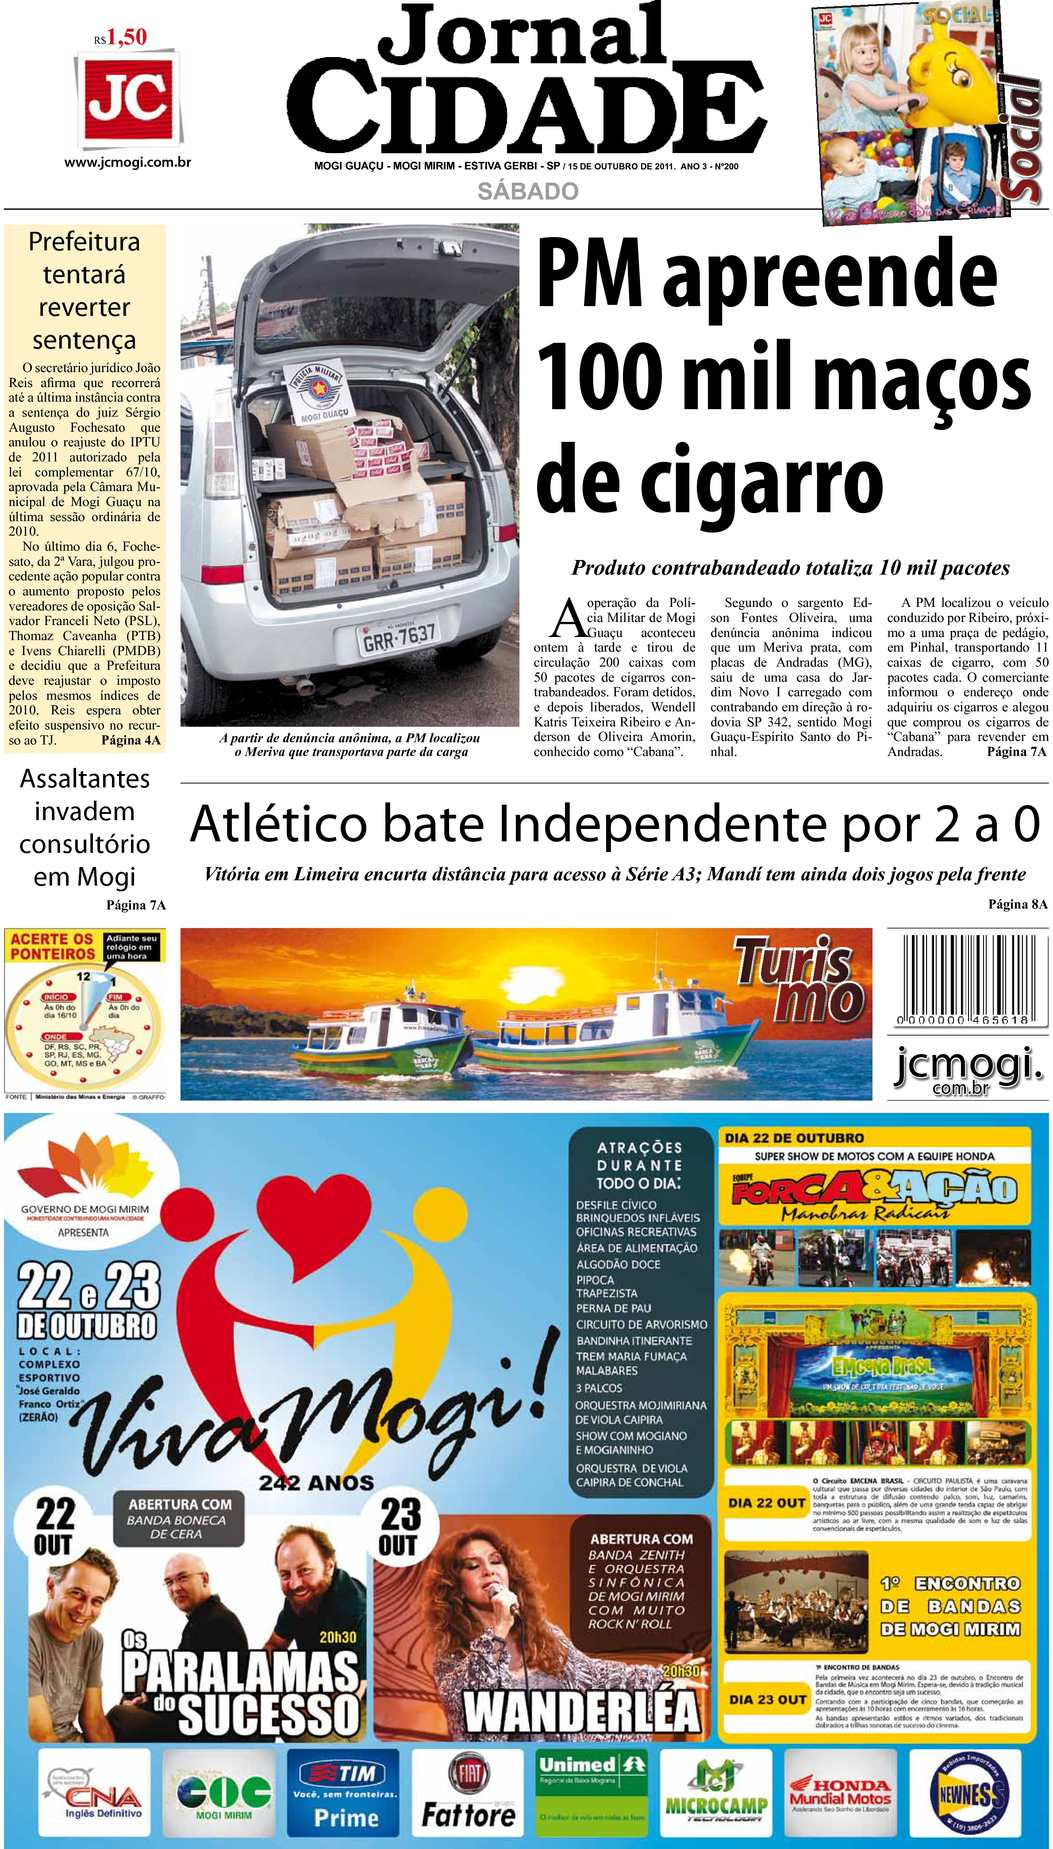 ff71a6906 Calaméo - JC MOGI GUAÇU - 15-10-2011